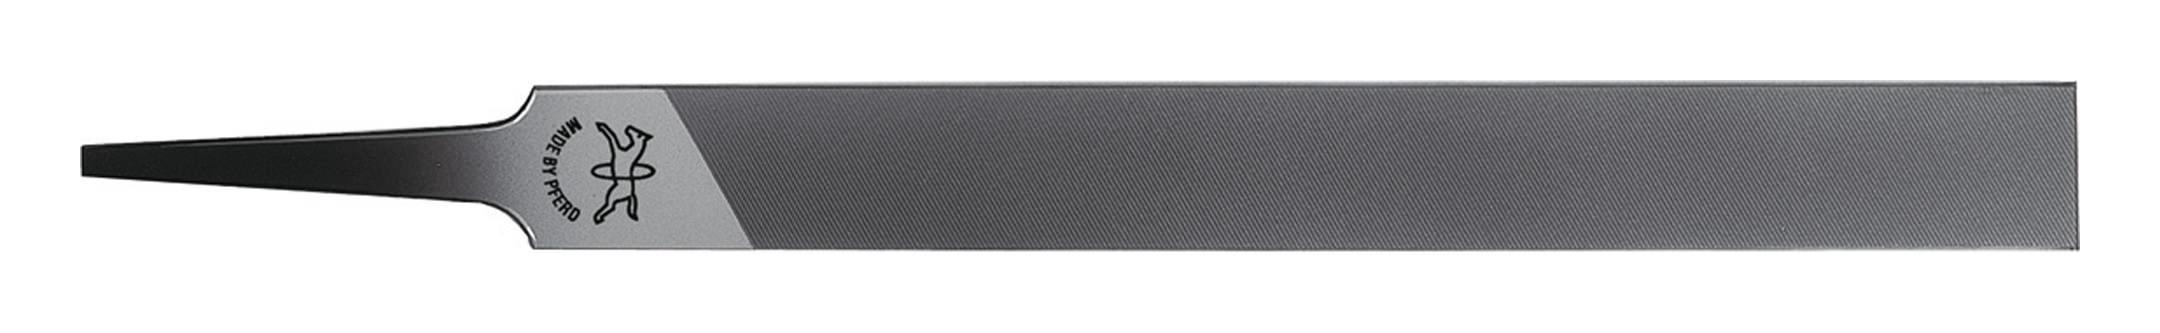 Kettensägenfeile 1213 RUK 200mm Hieb 2 flach - 11610203